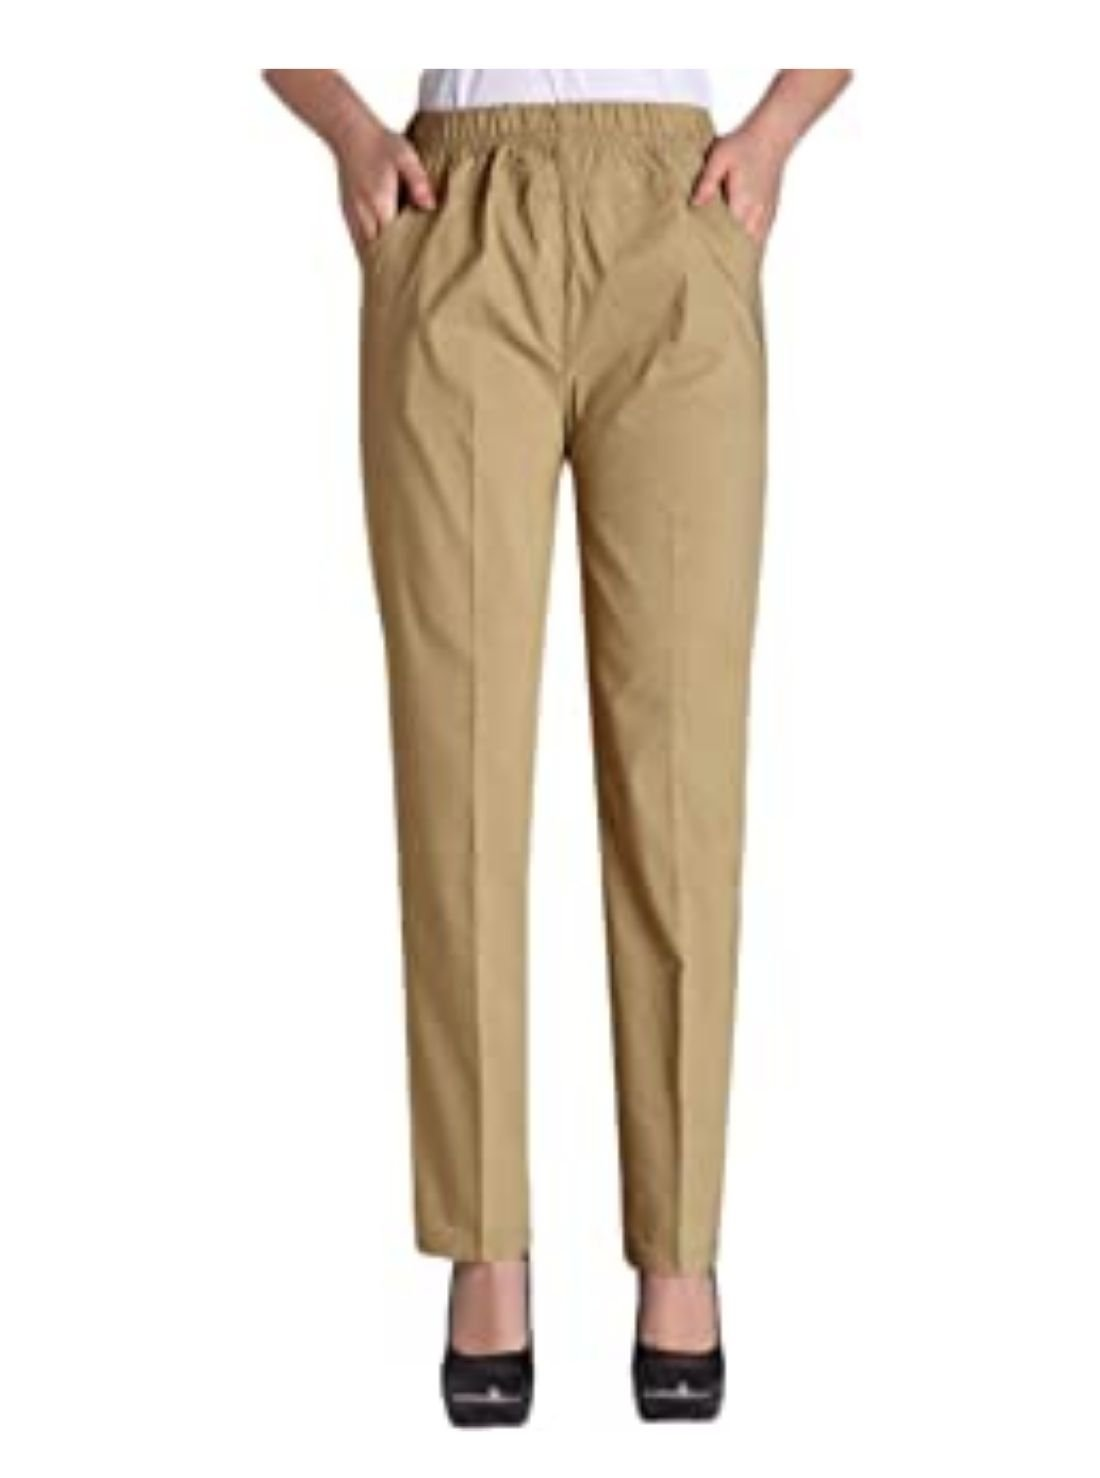 Stylish Cabin Creek Pants